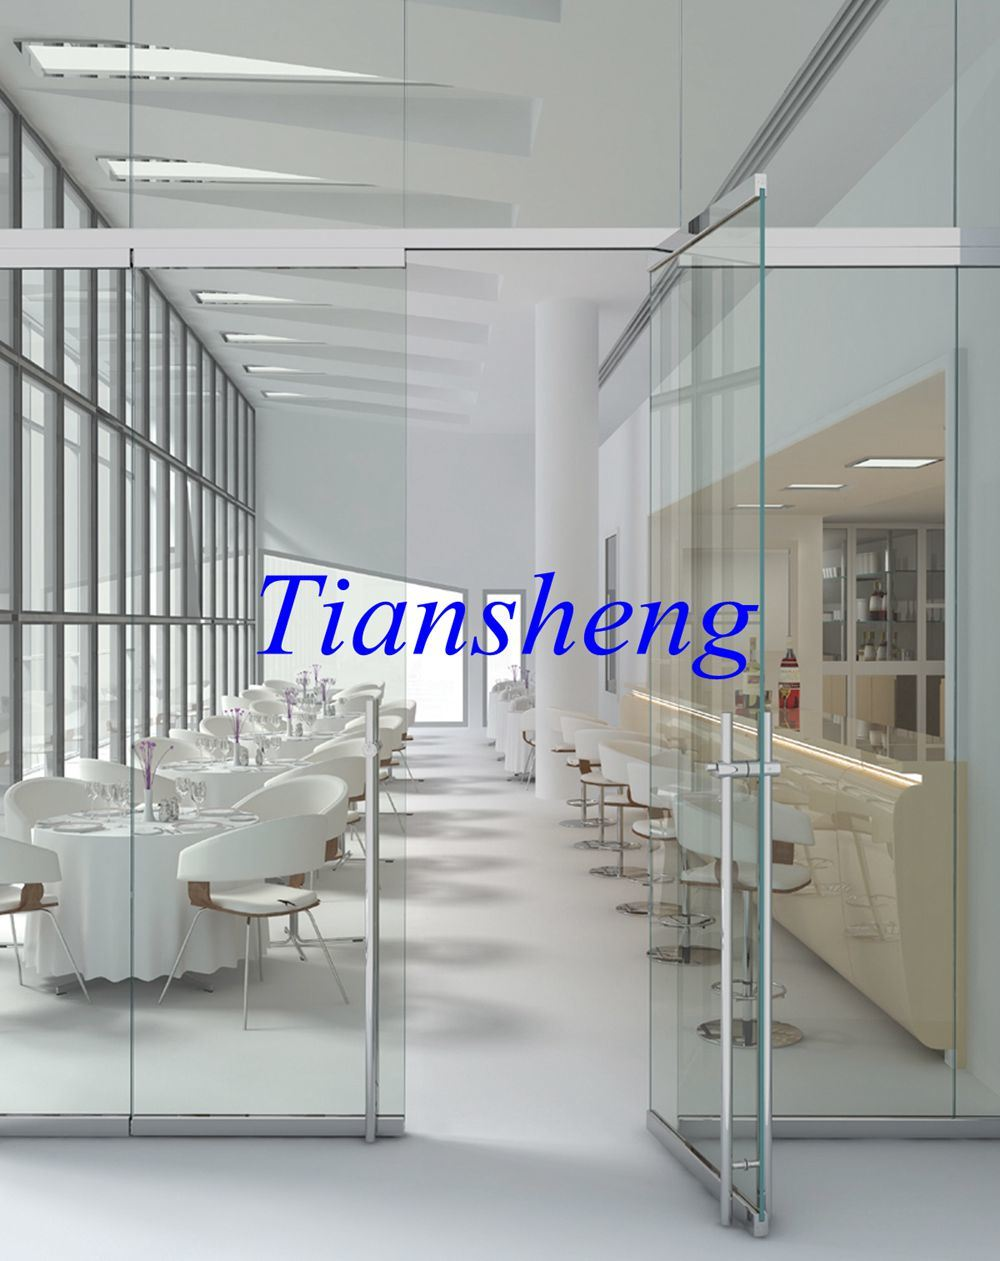 China Frameless Pivot Entry Door Multifold Glass Door Concertina Folding Door Photos Pictures Made In China Com